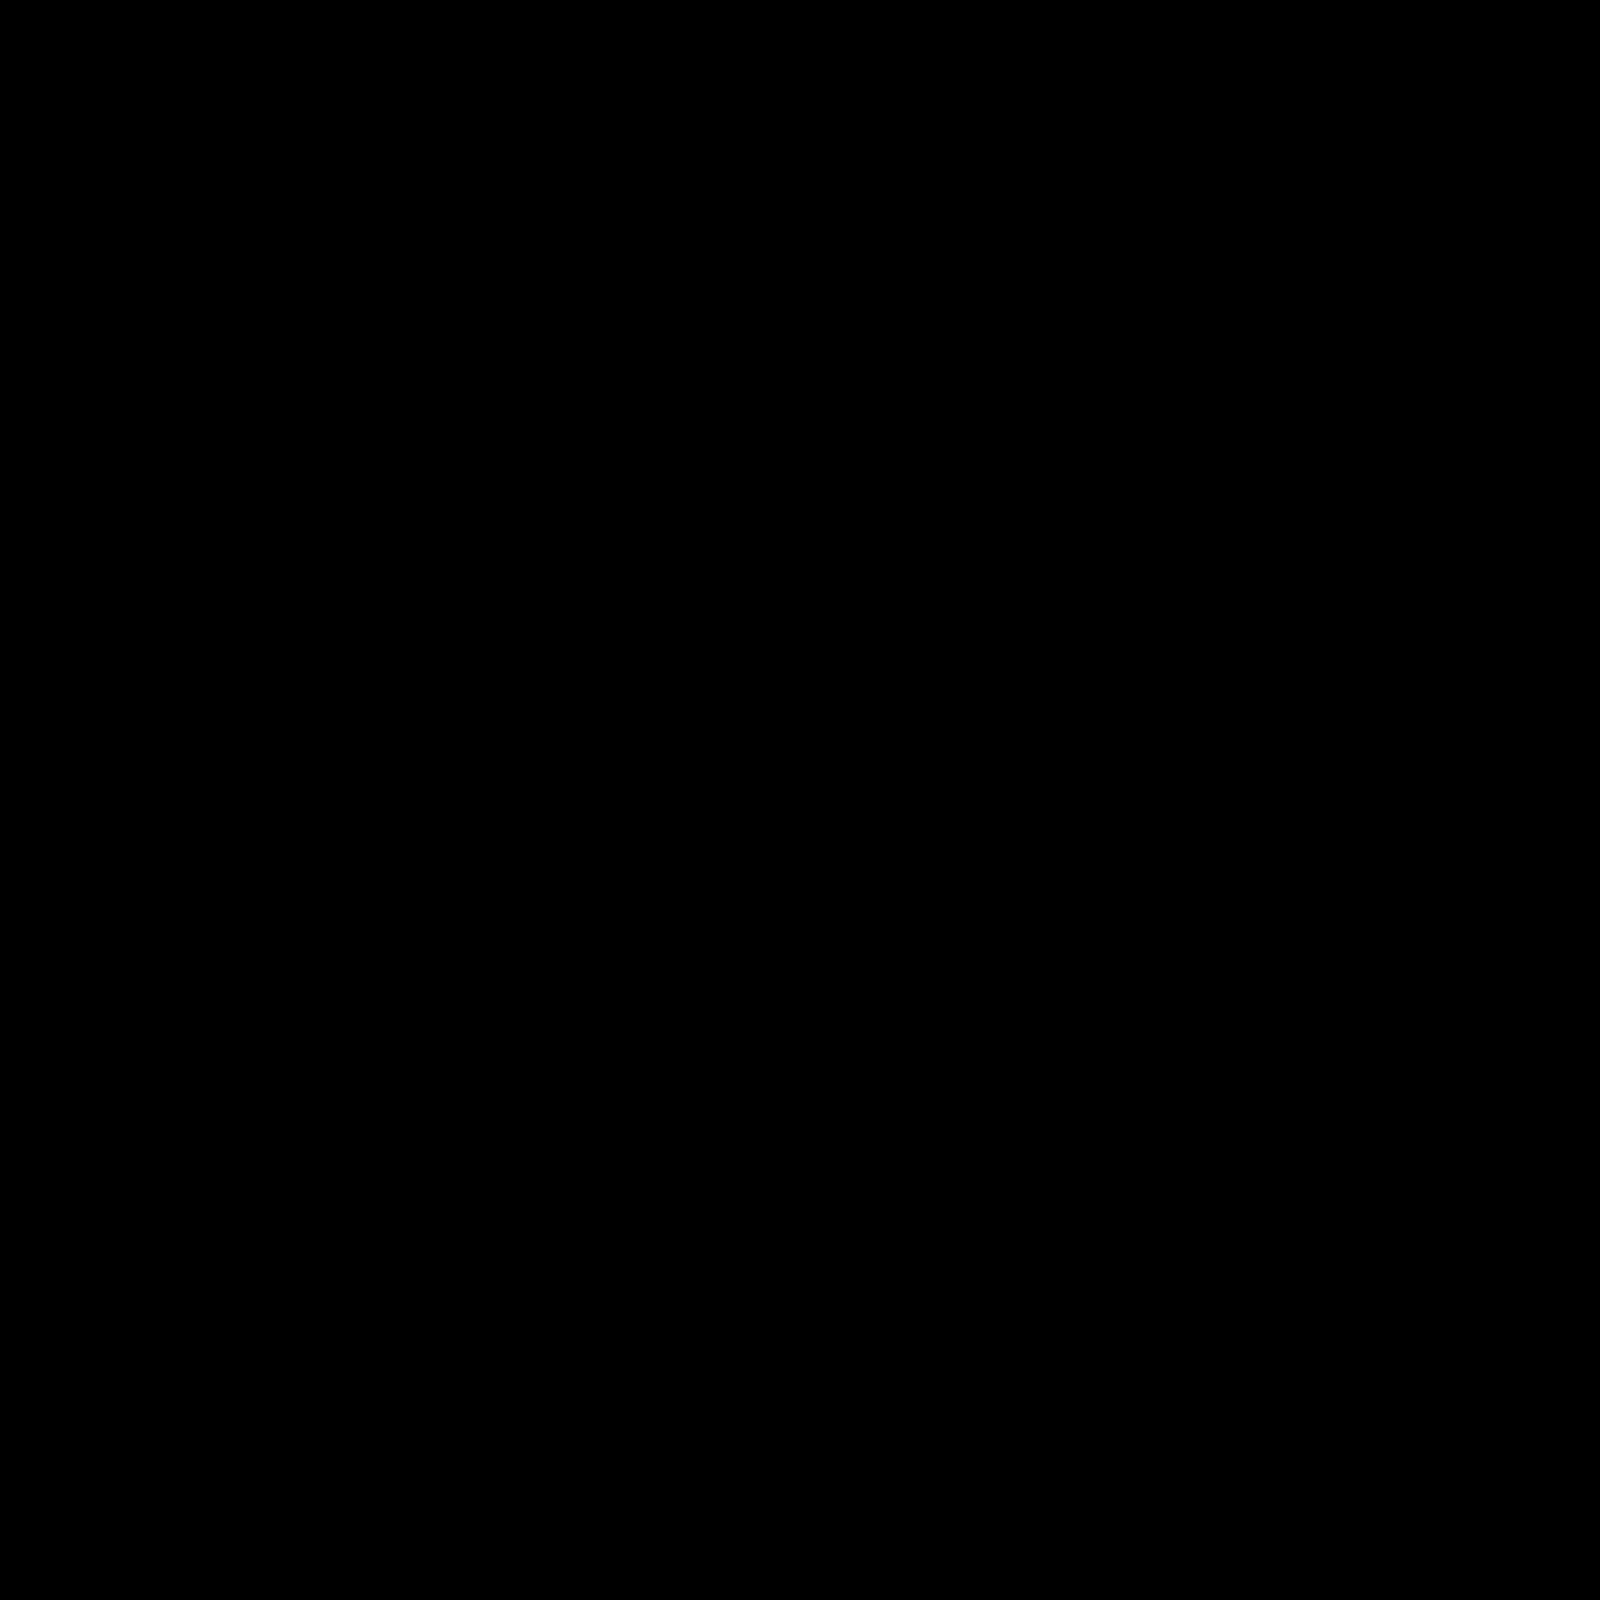 Joomla Filled icon